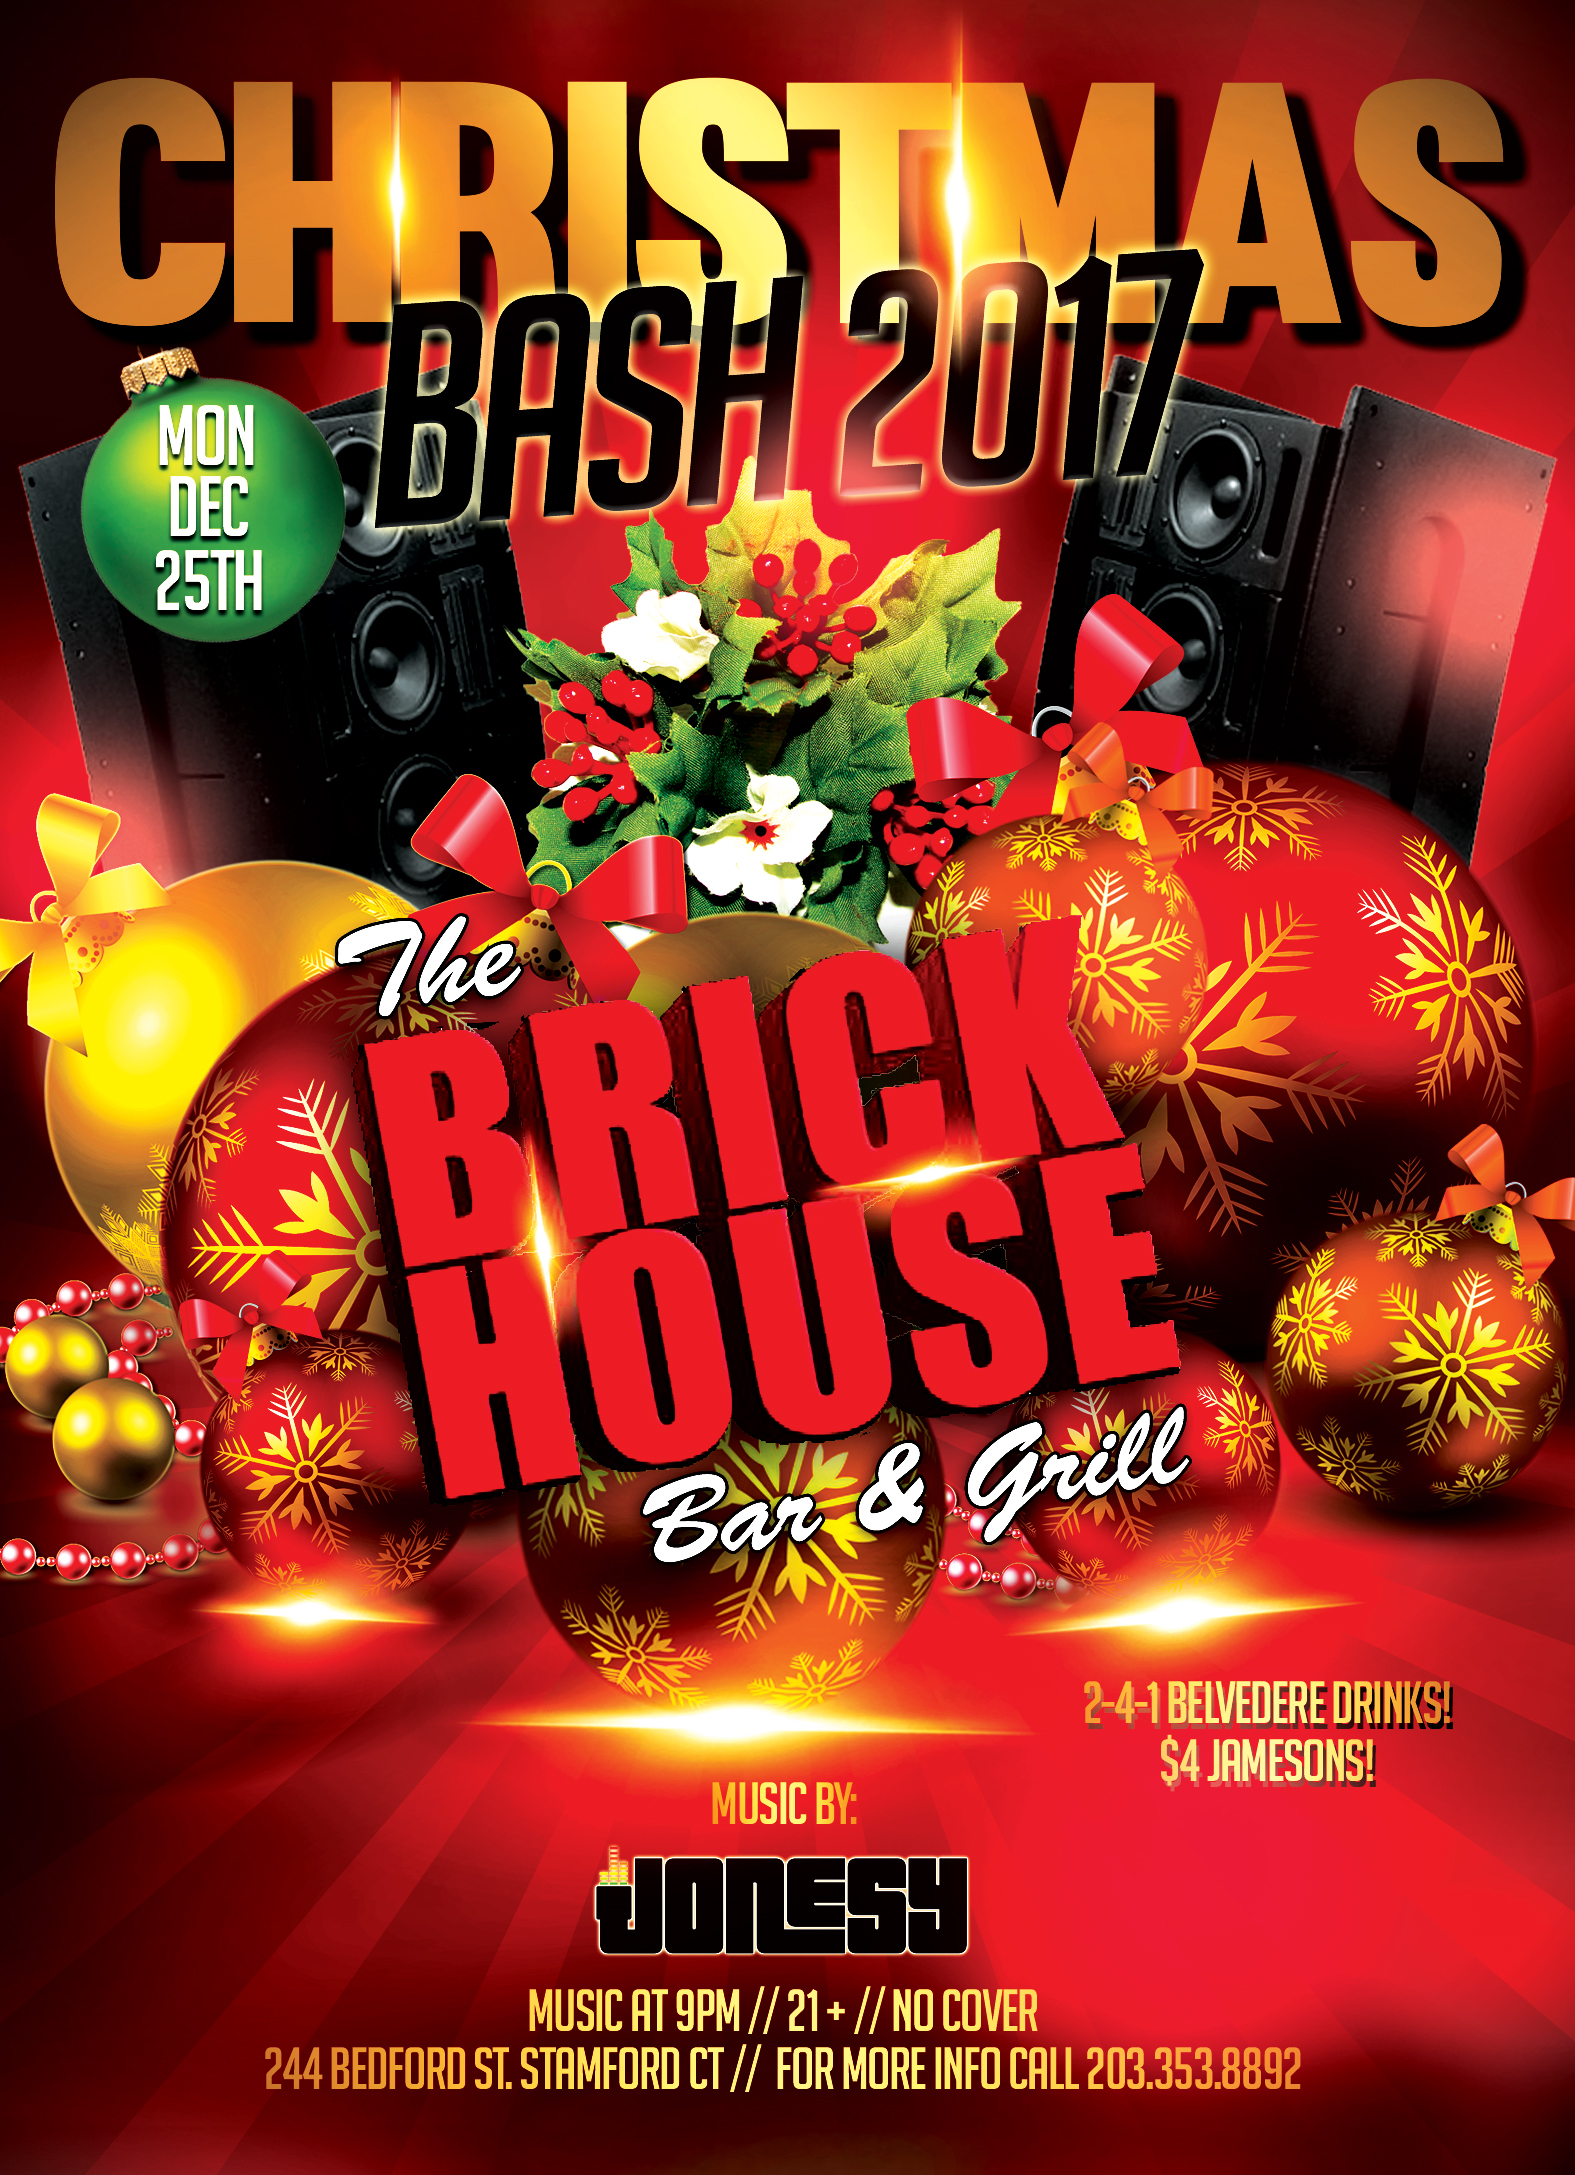 Christmas_Bash-brickhouse2017.jpg